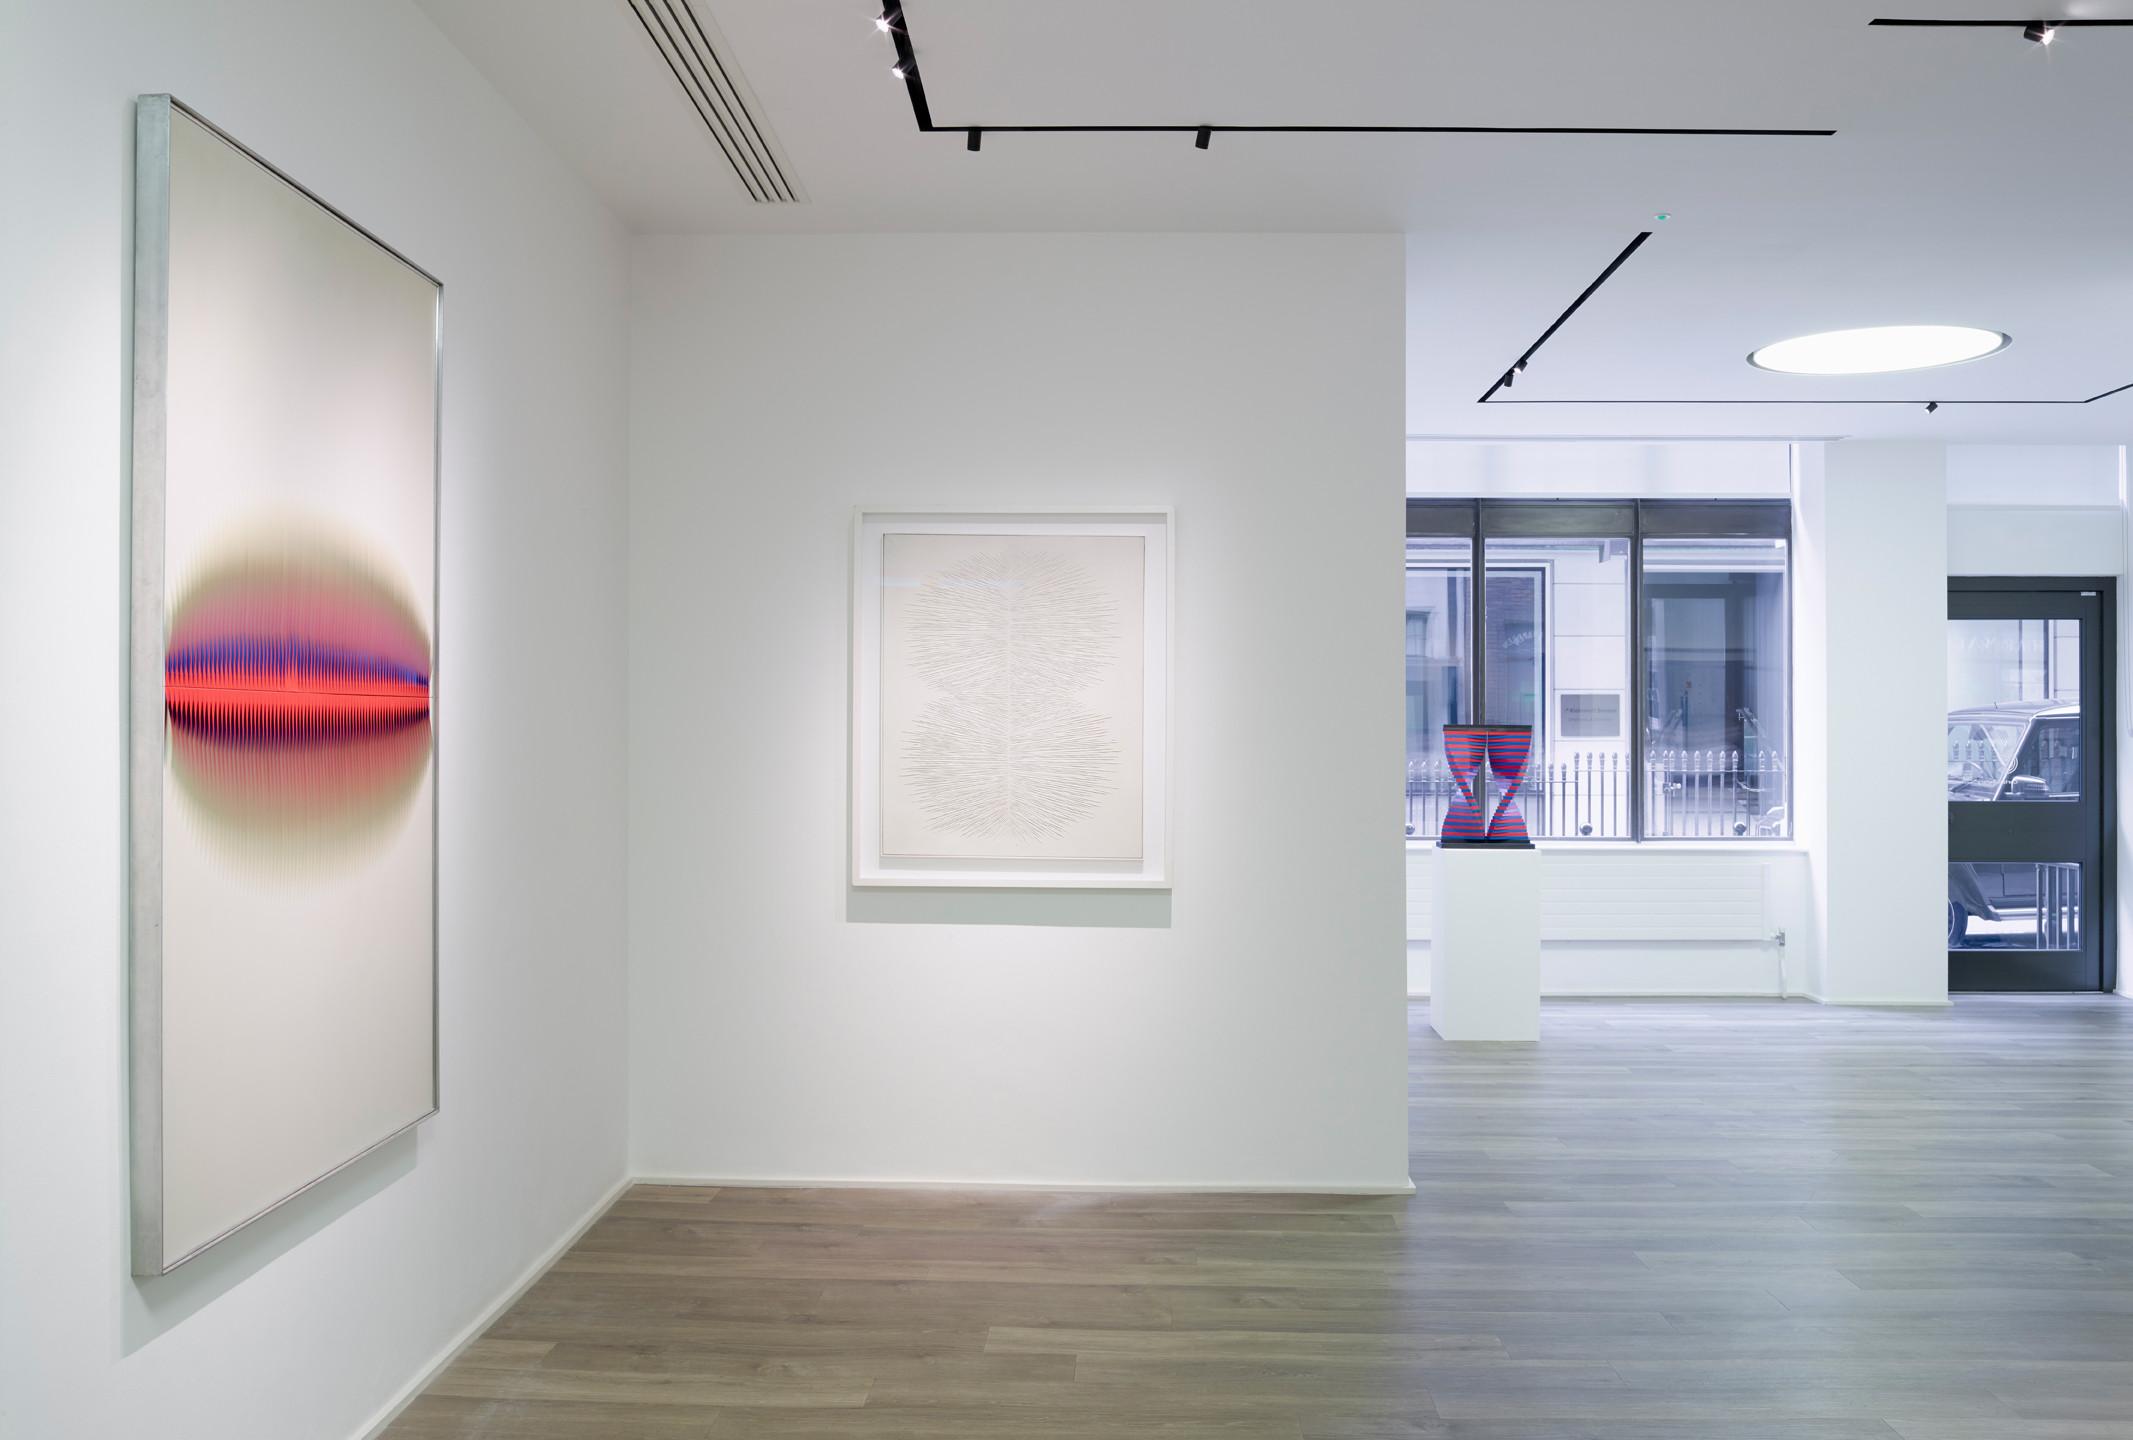 "Installation views ""Walter Leblanc. Sensorial Geometries"", Cortesi Gallery, London Photo by Peter Mallet. Courtesy Cortesi Gallery London, Milan,  Lugano."